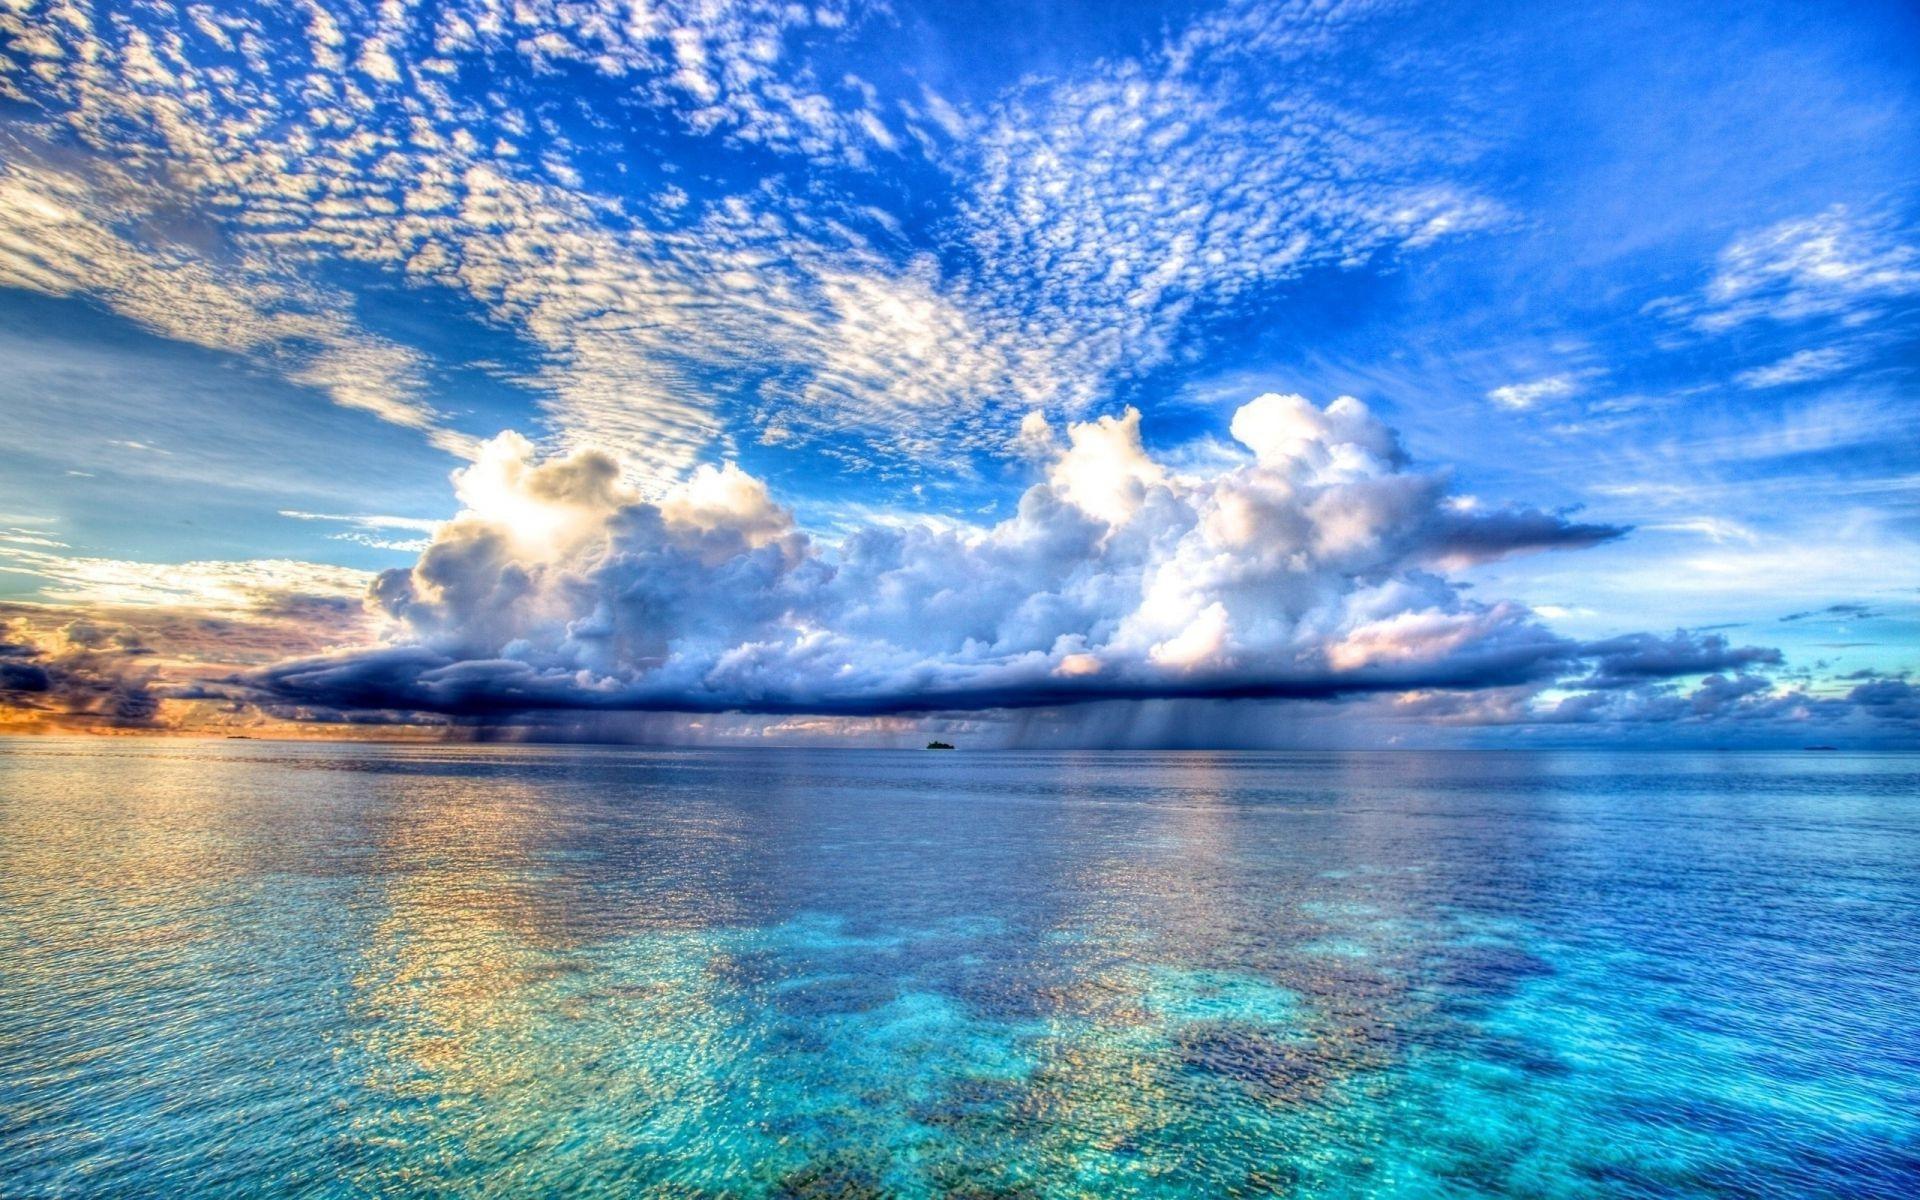 [Изображение: okean-gorizont-nebo-oblaka-dal-korabli-cvet-krasota.jpg]